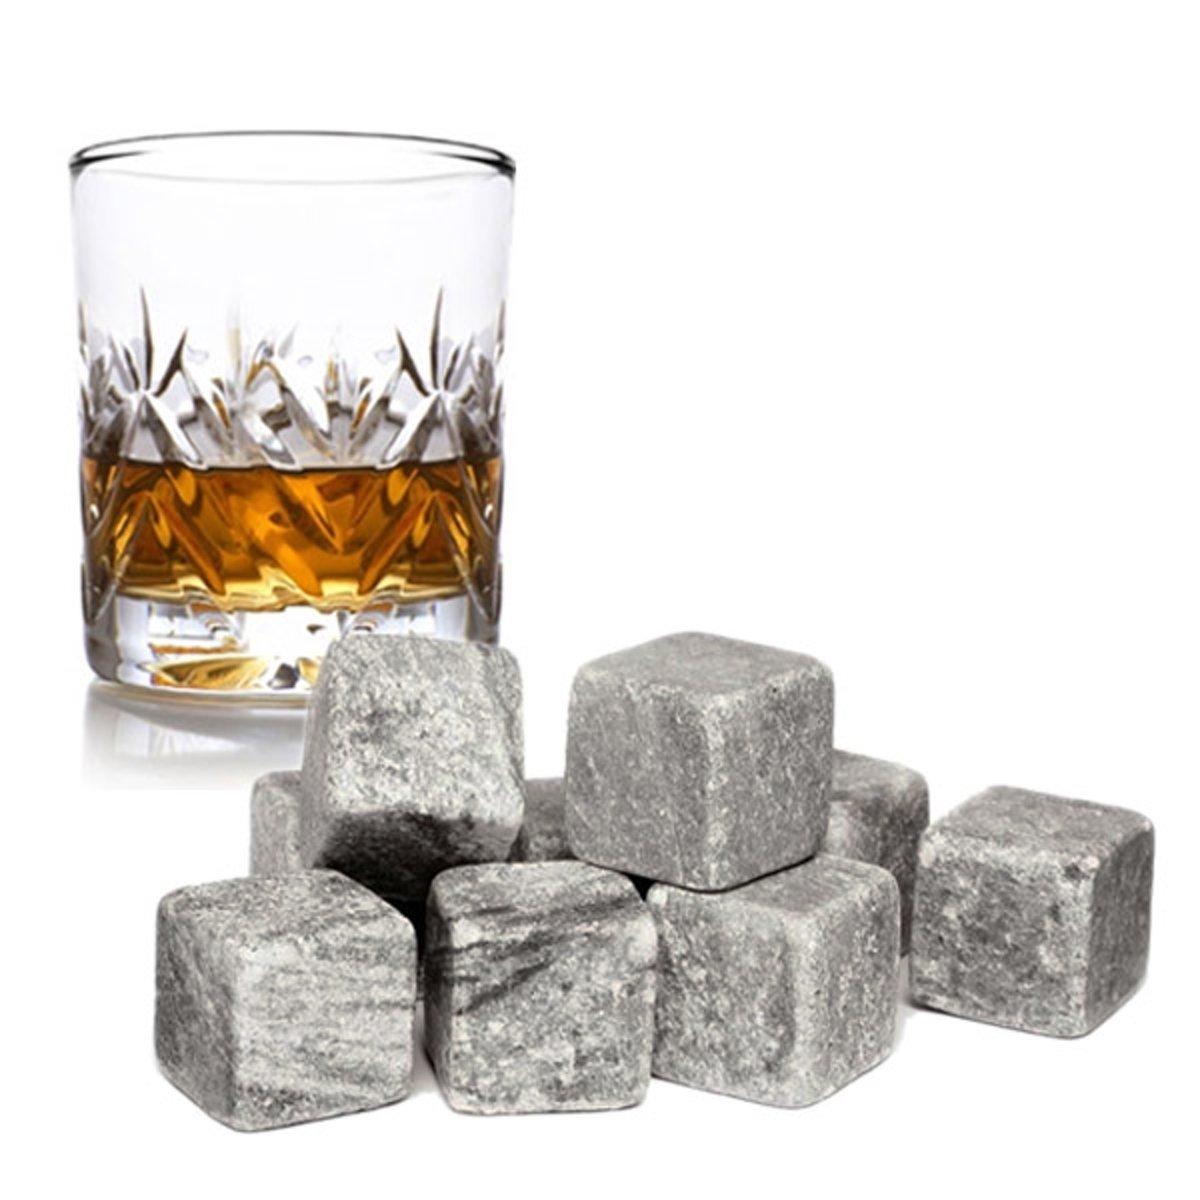 Whiskey stenen - Whiskey stones - Koelstenen - Ijsblokken 9 stuks kopen